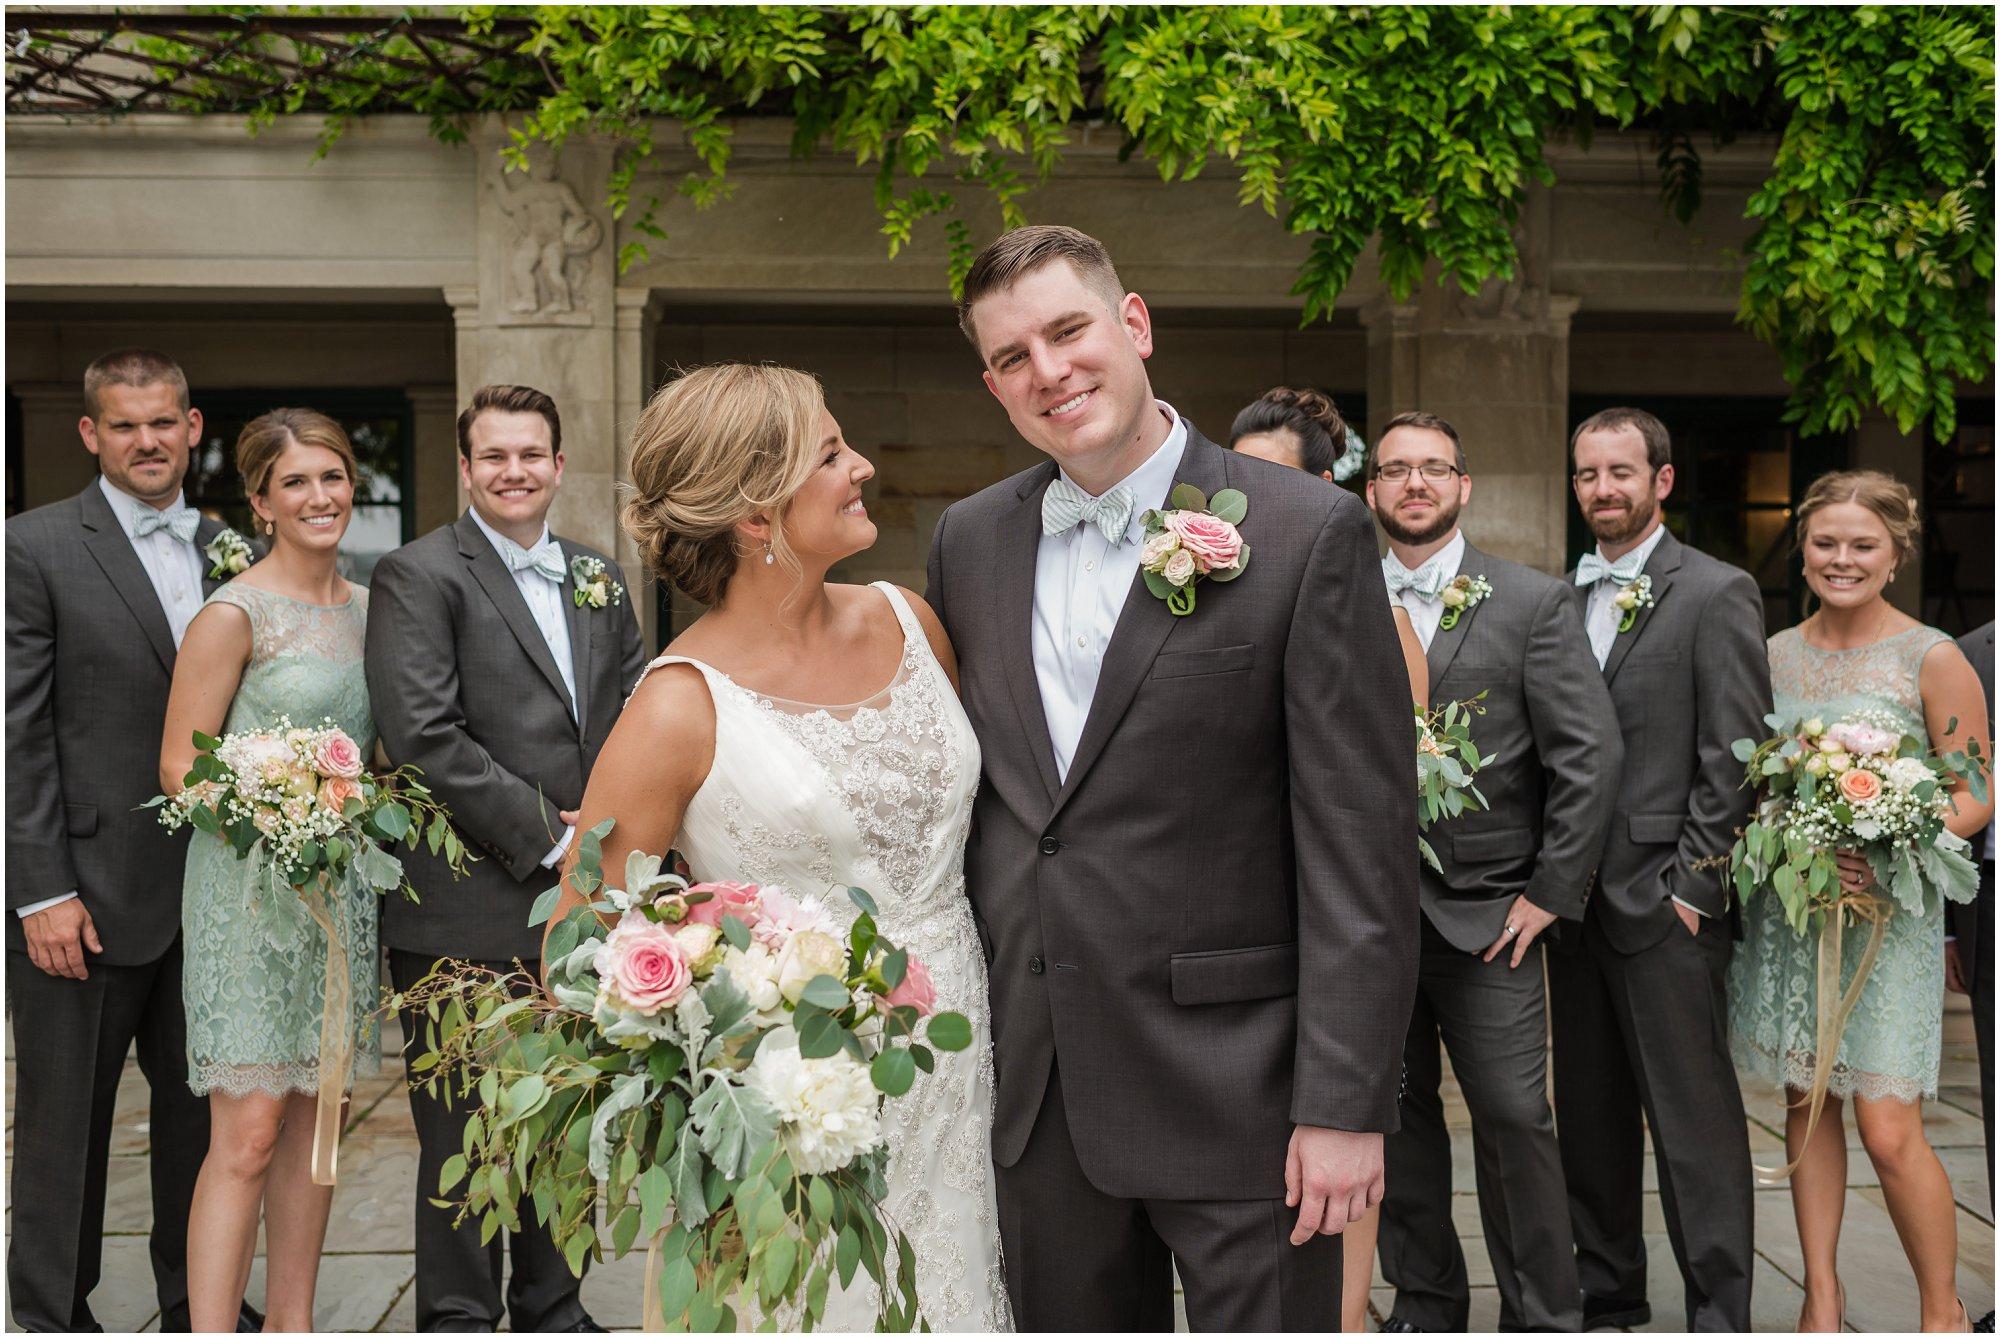 Plymouth_michigan_wedding_photographer_0409.jpg